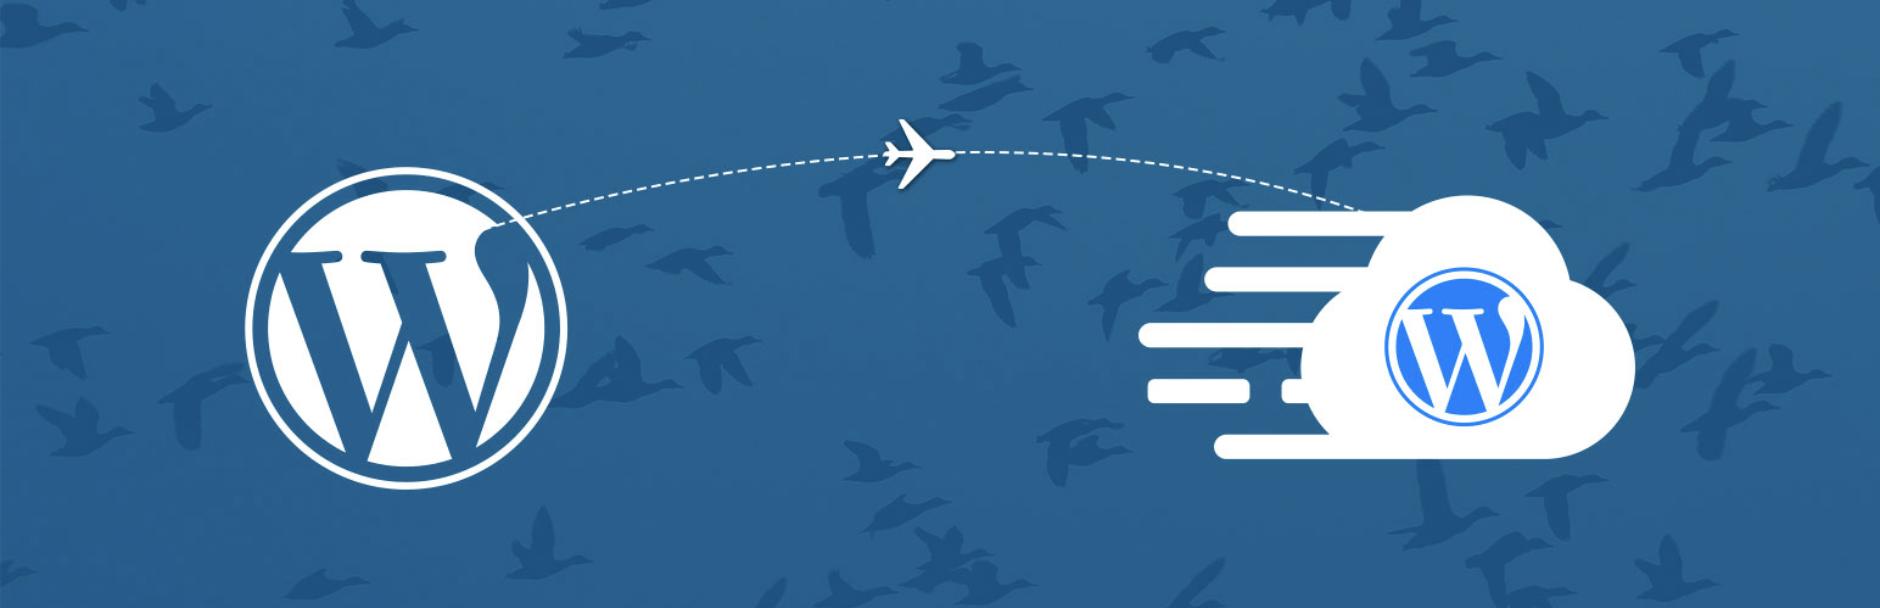 cloudways-wordpress-migrator